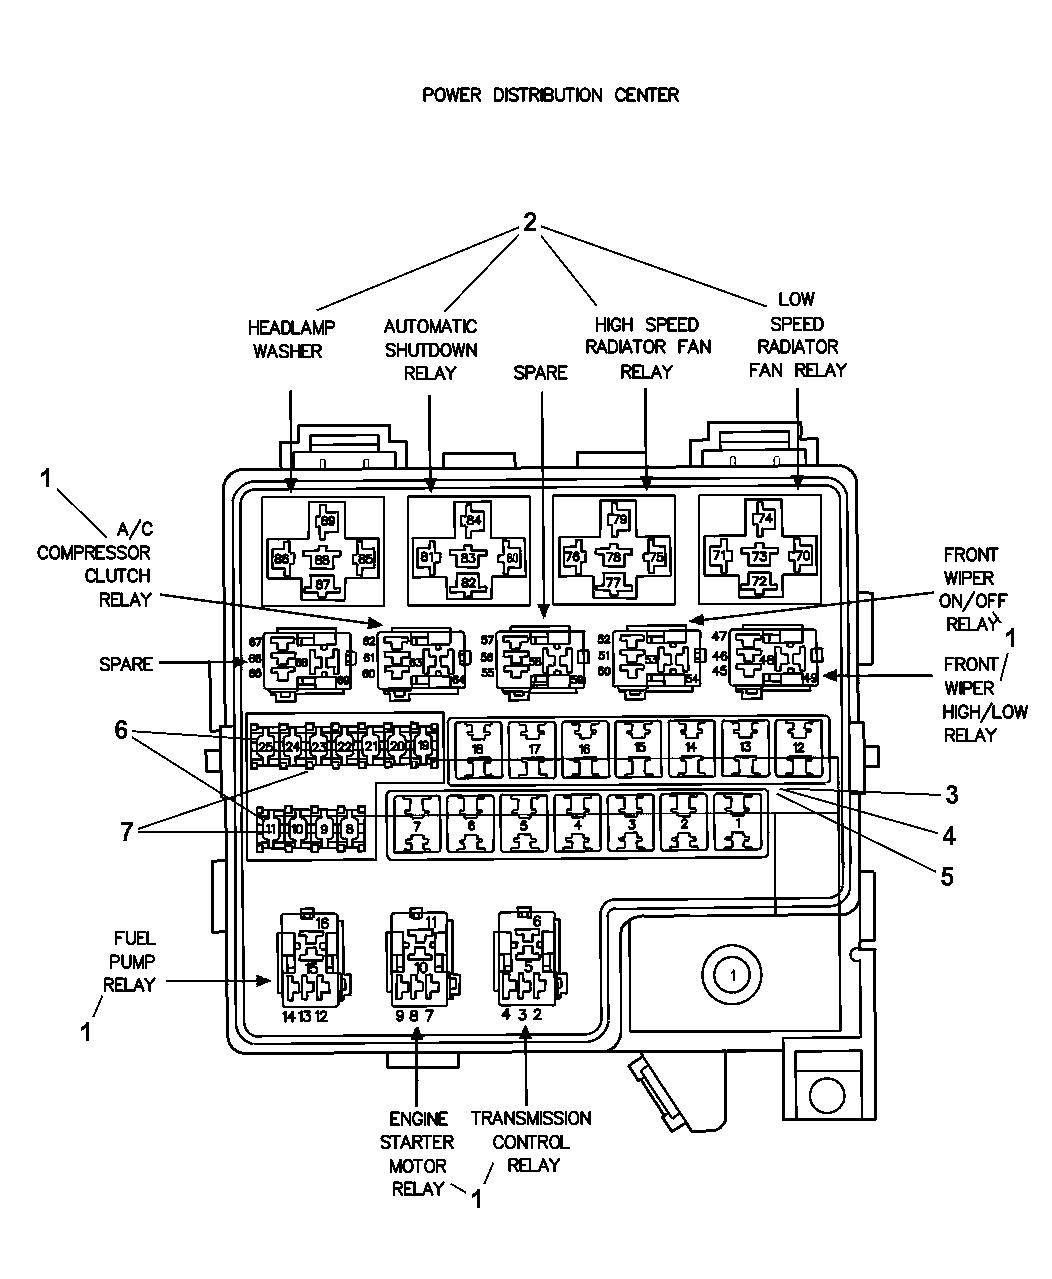 2004 Dodge Stratus Sedan Power Distribution Center Relays Electrical Relay Explanation